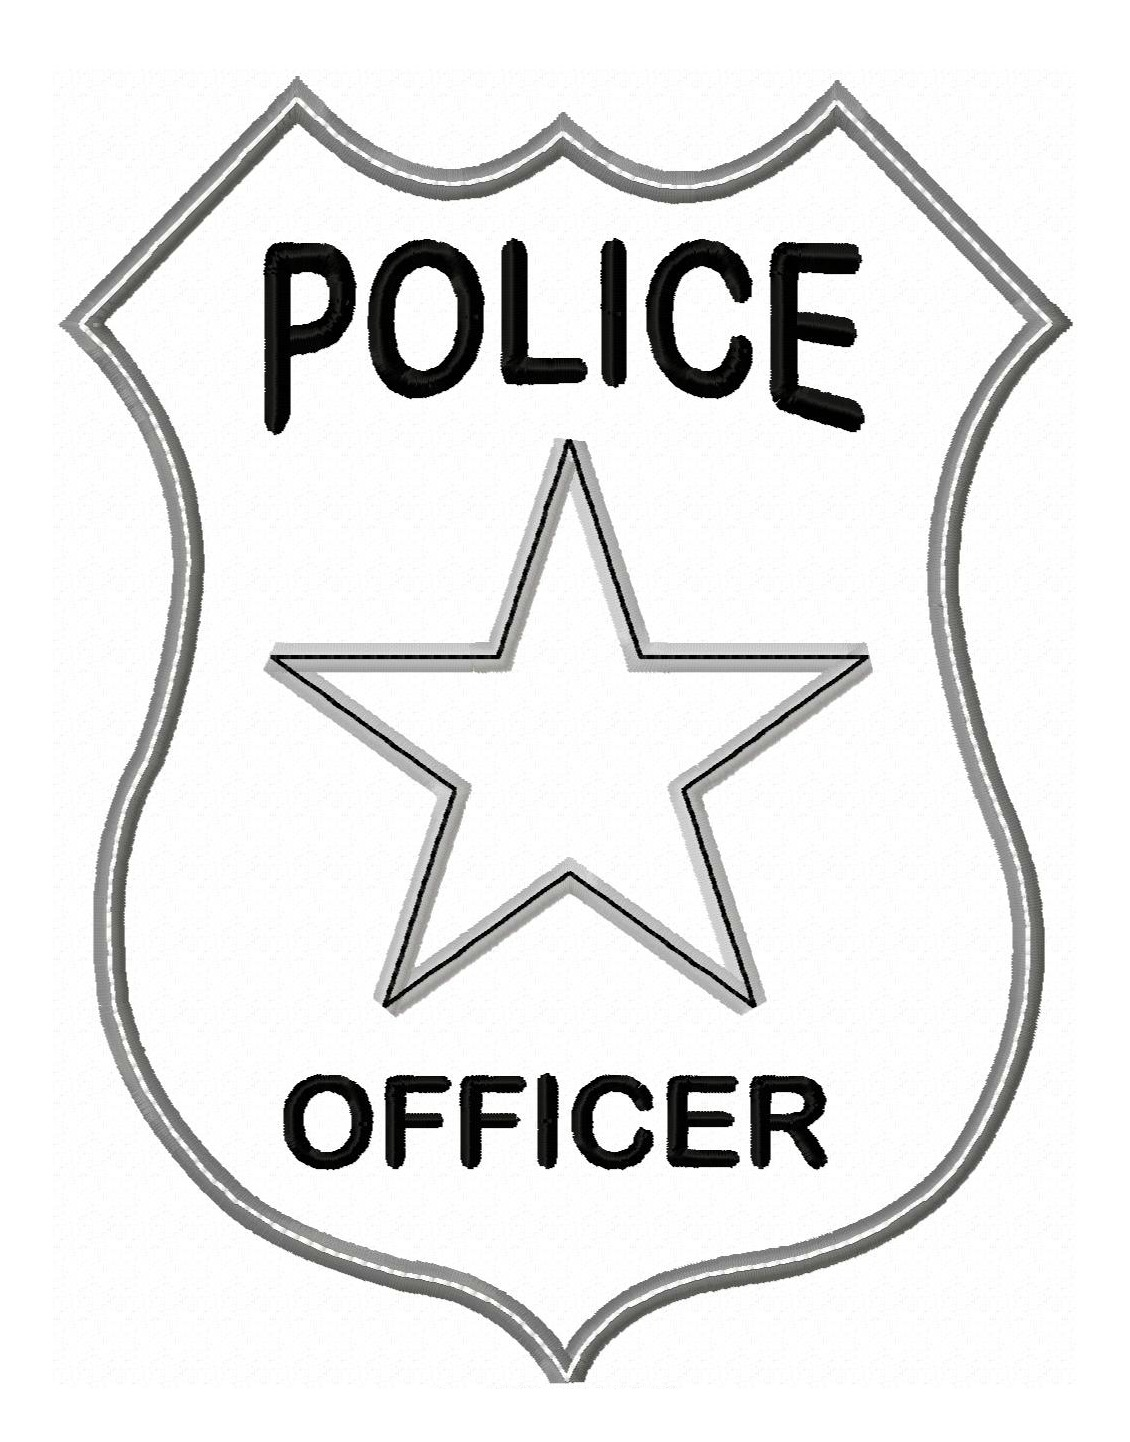 Clip Art Police Badge Clip Art badge officer outline clipart kid police applique